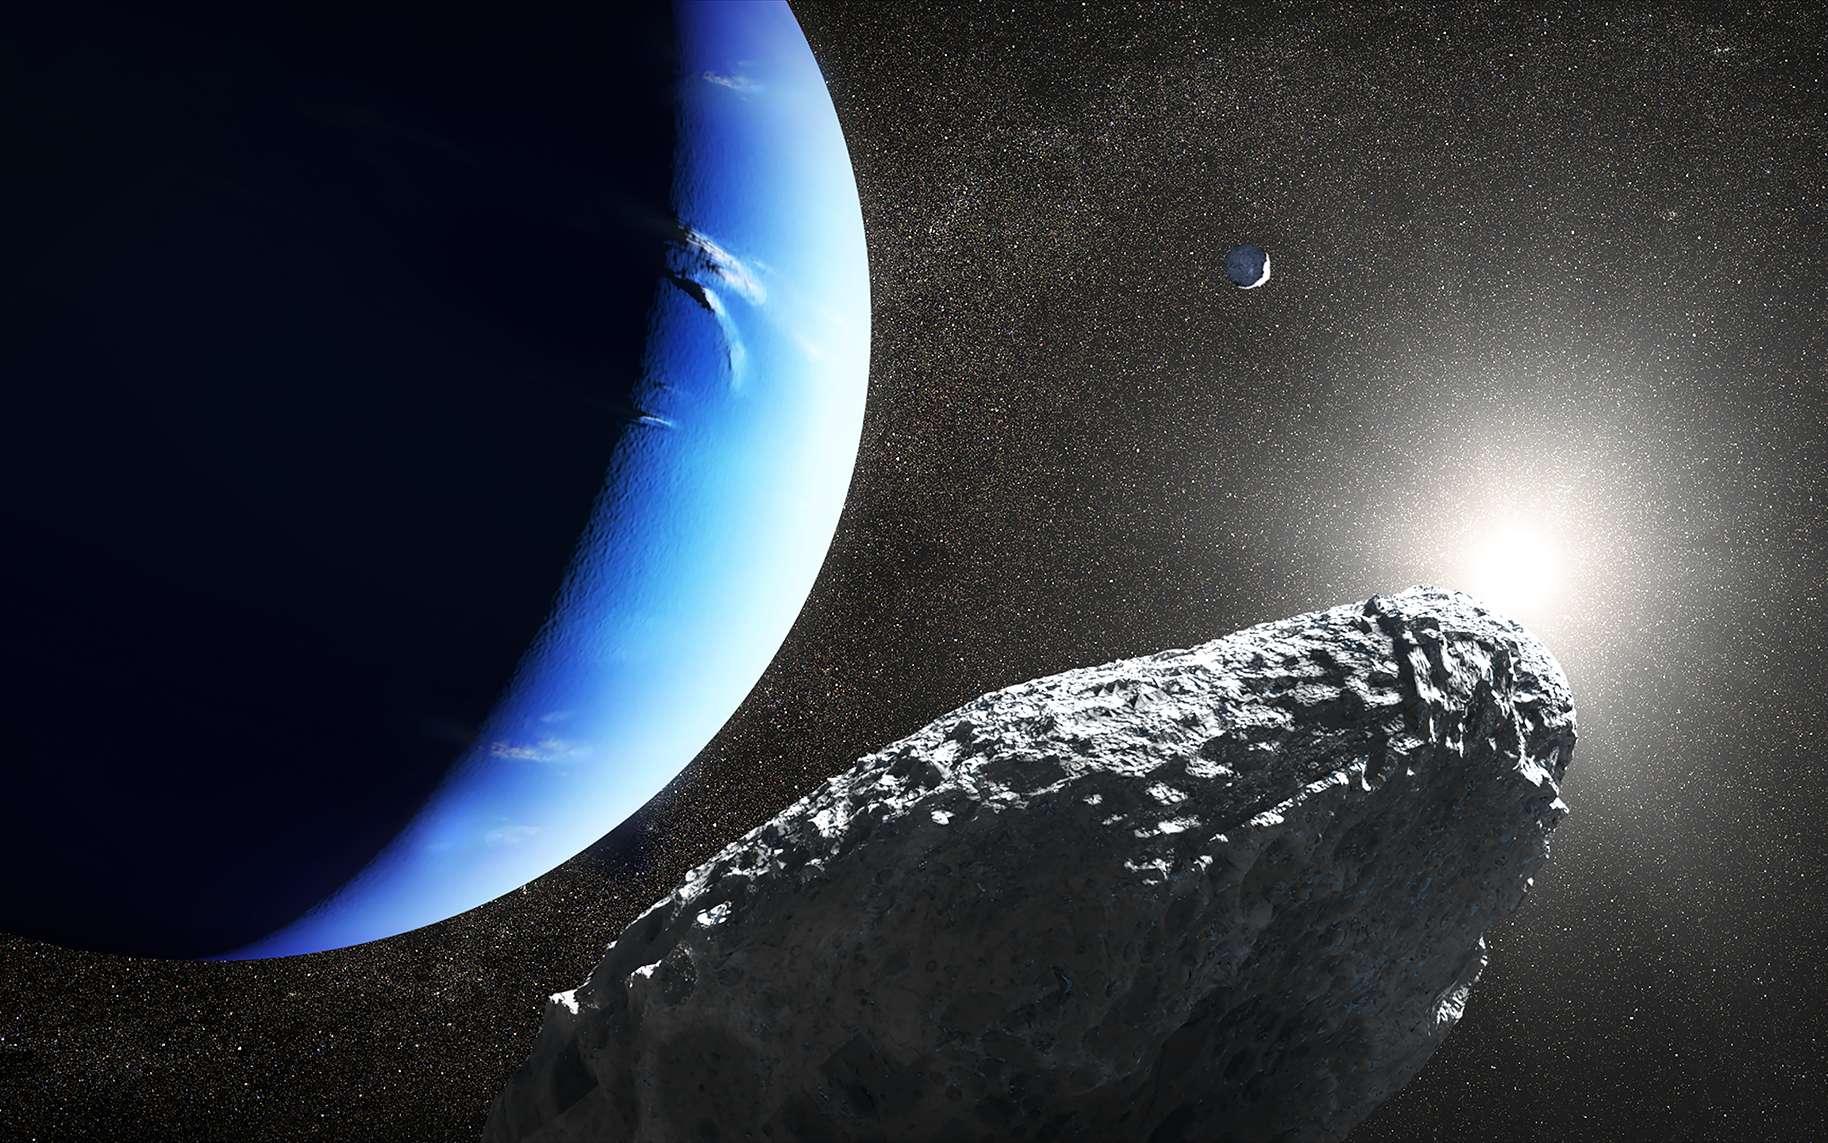 Une vue d'artiste d'Hippocampe autour de Neptune. © Nasa, ESA and J. Olmsted (STScI)